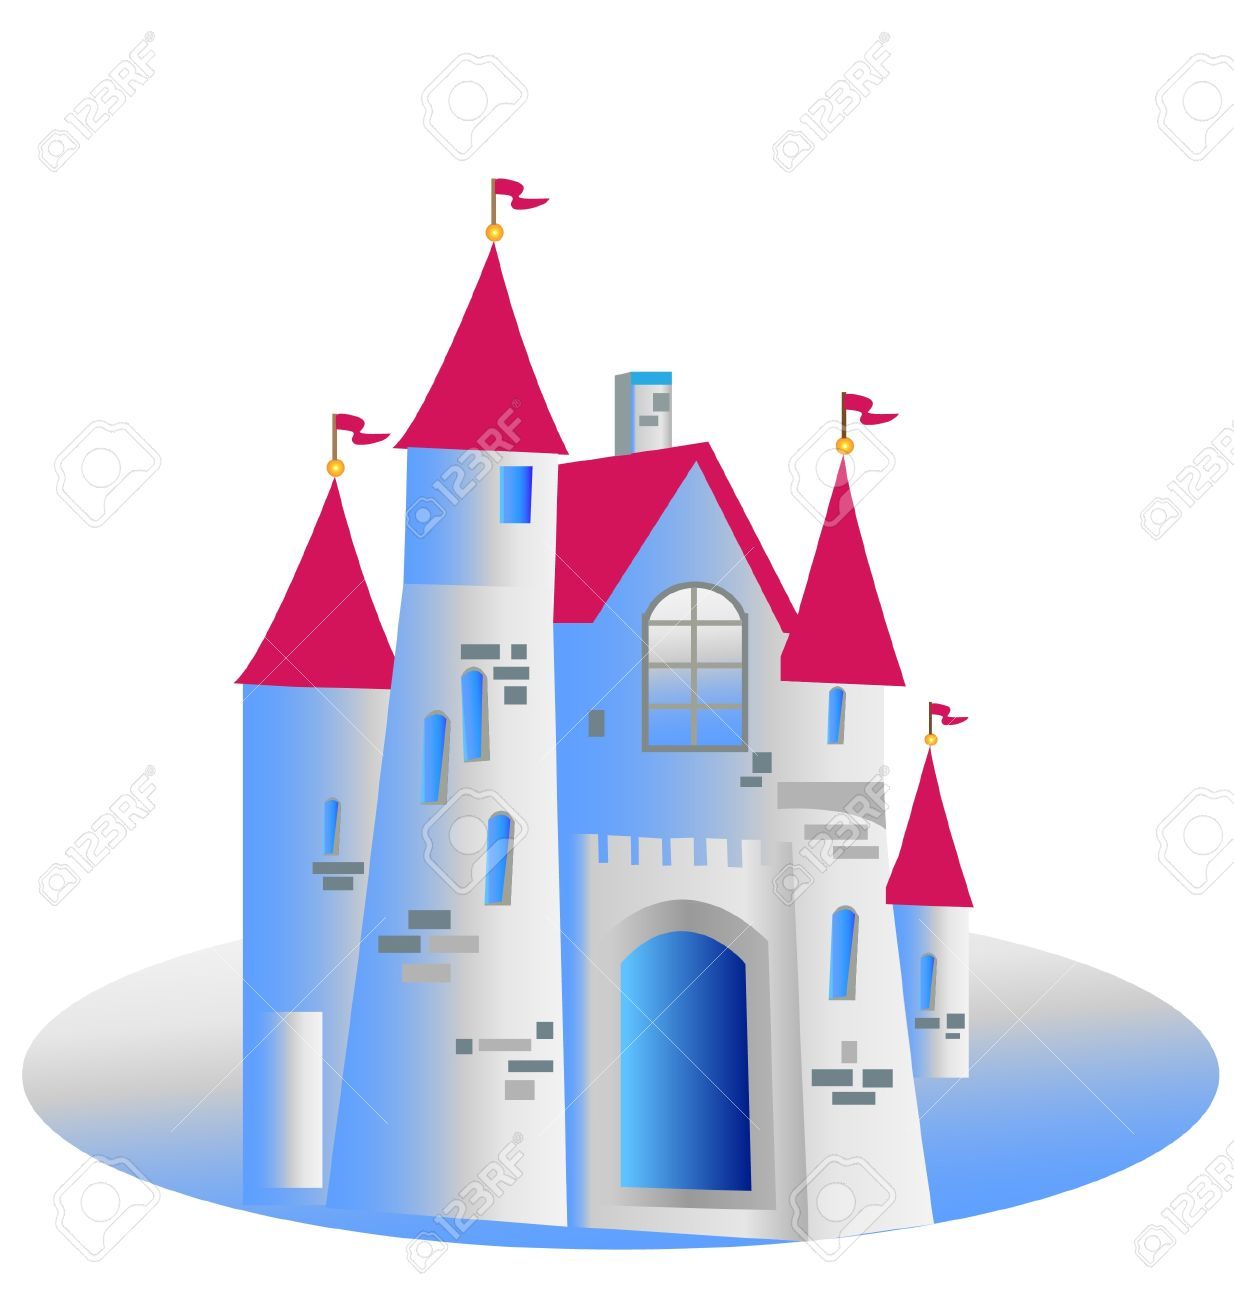 princess castle vector illustration royalty free cliparts vectors rh 123rf com castle victorian nebraska castle victoria british columbia canada